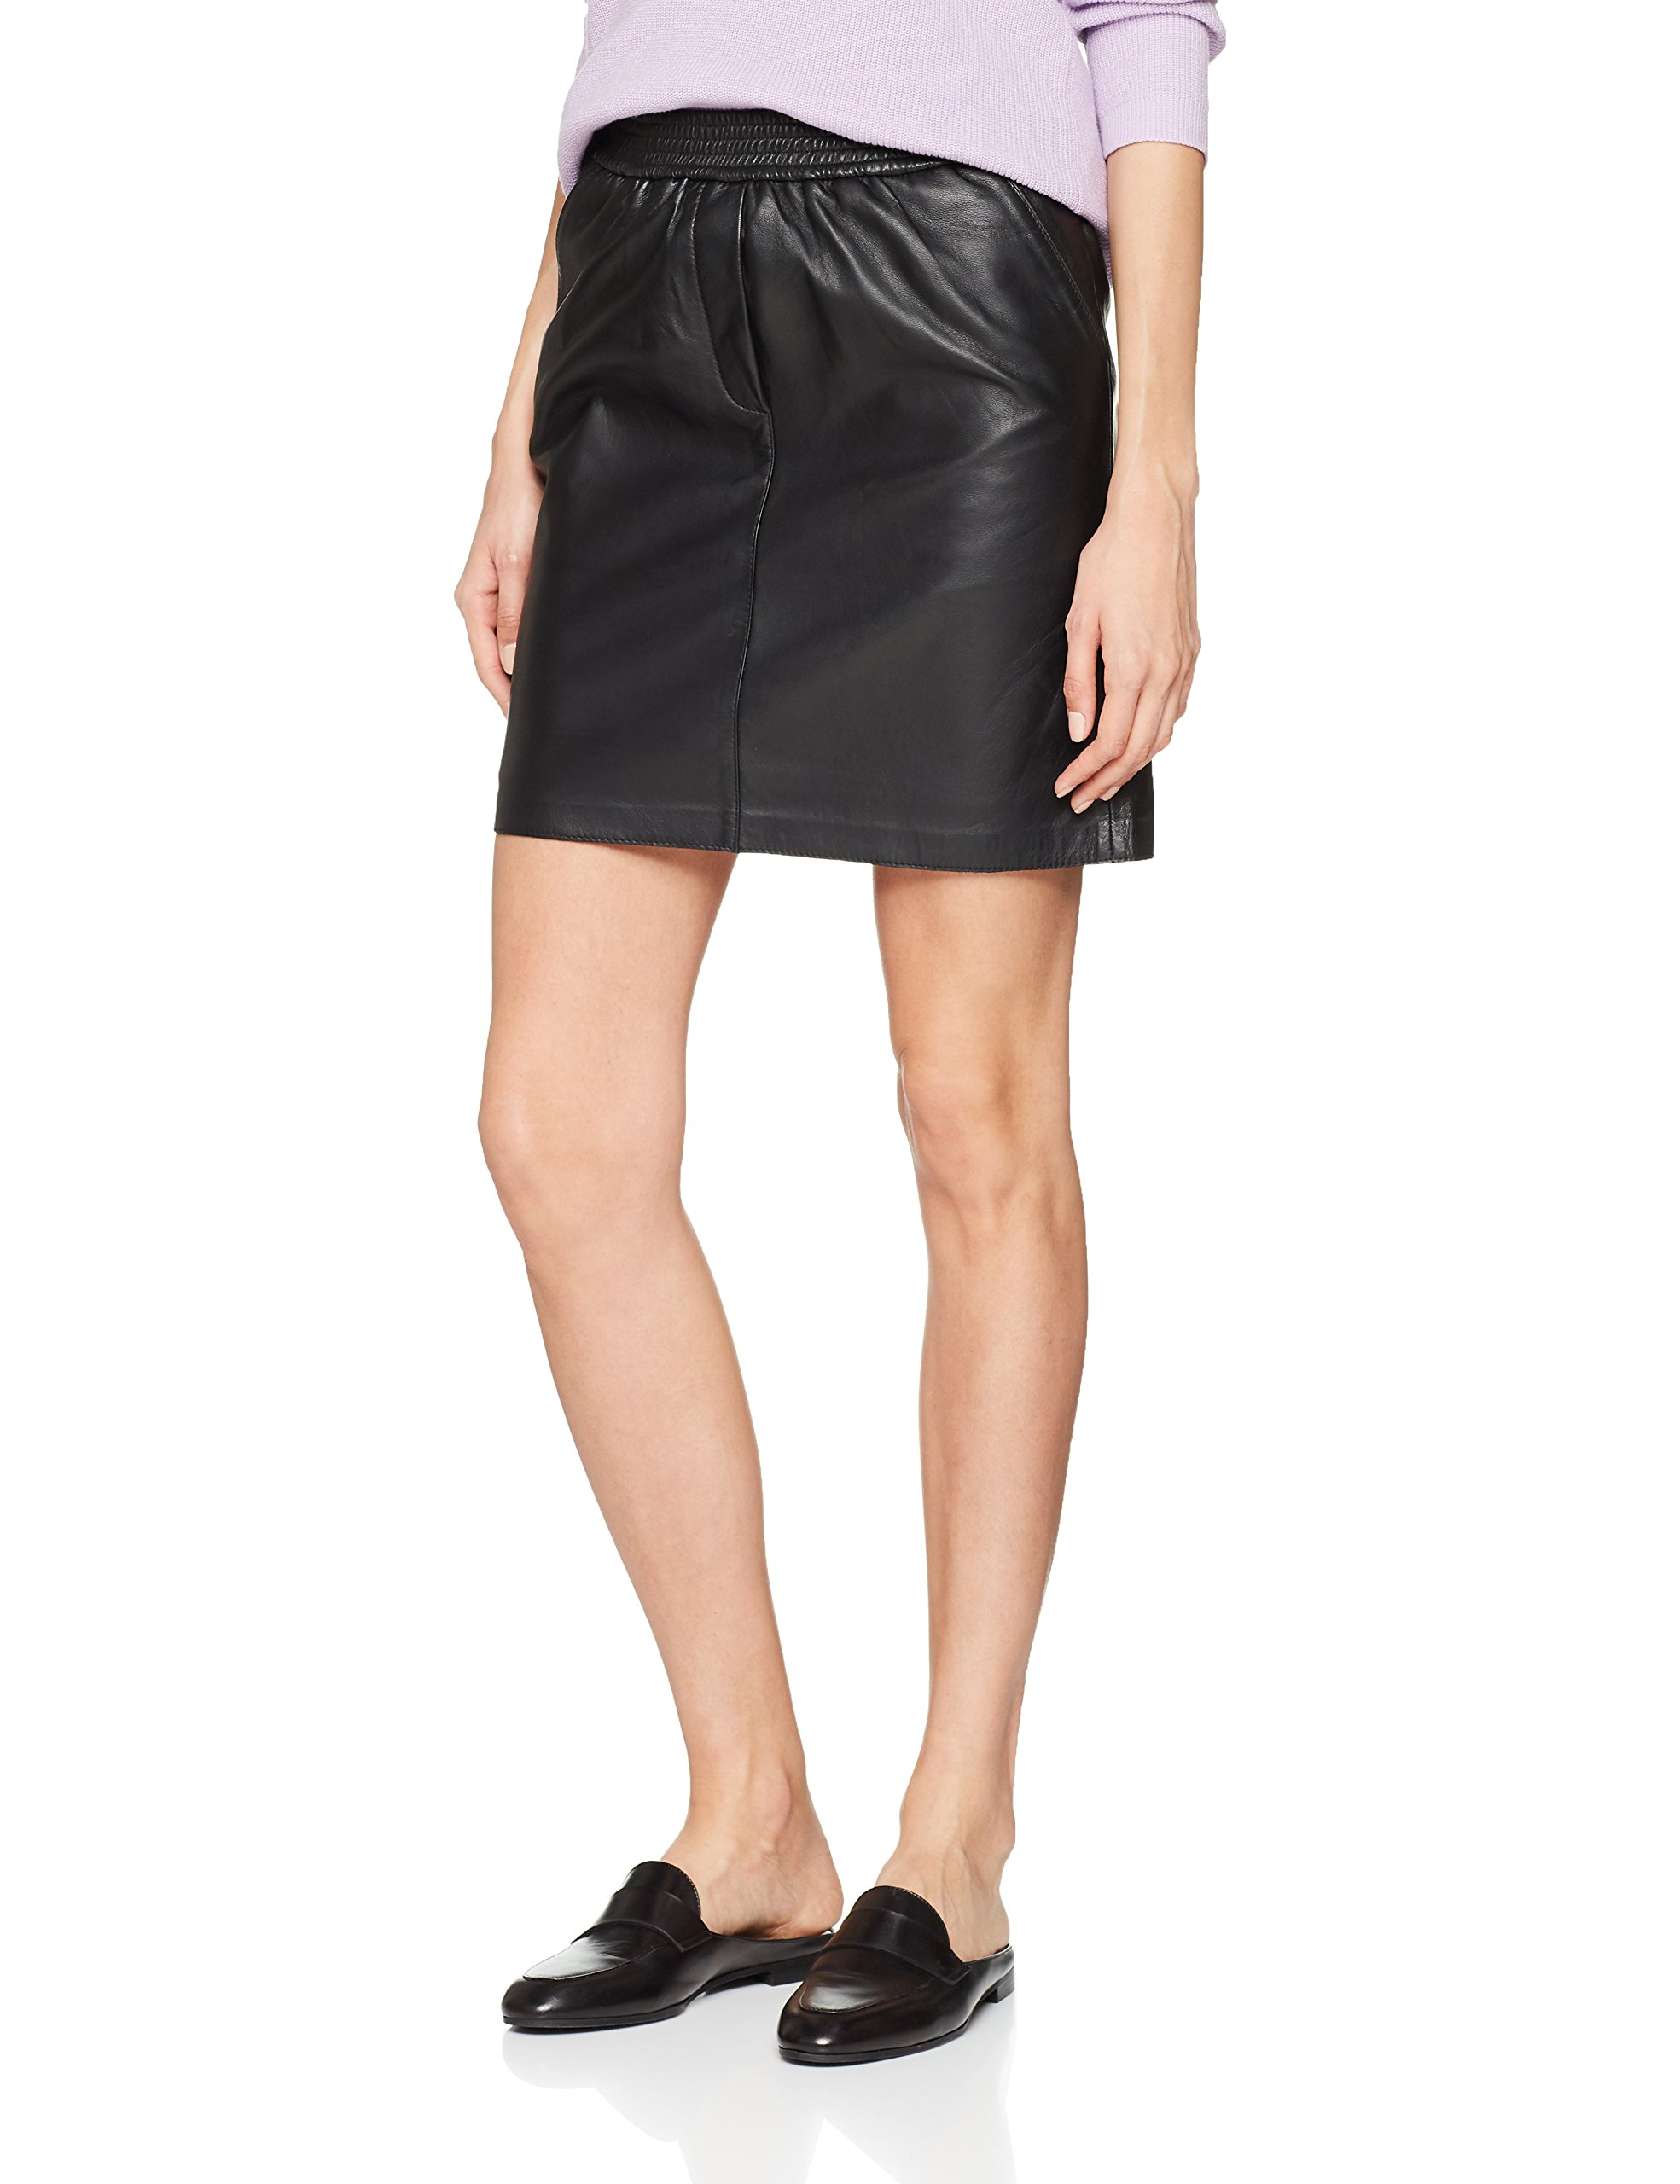 Female FabricantMediumFemme Leather 800140taille JupeNoirblack Adina Skirt Second sQrdthC